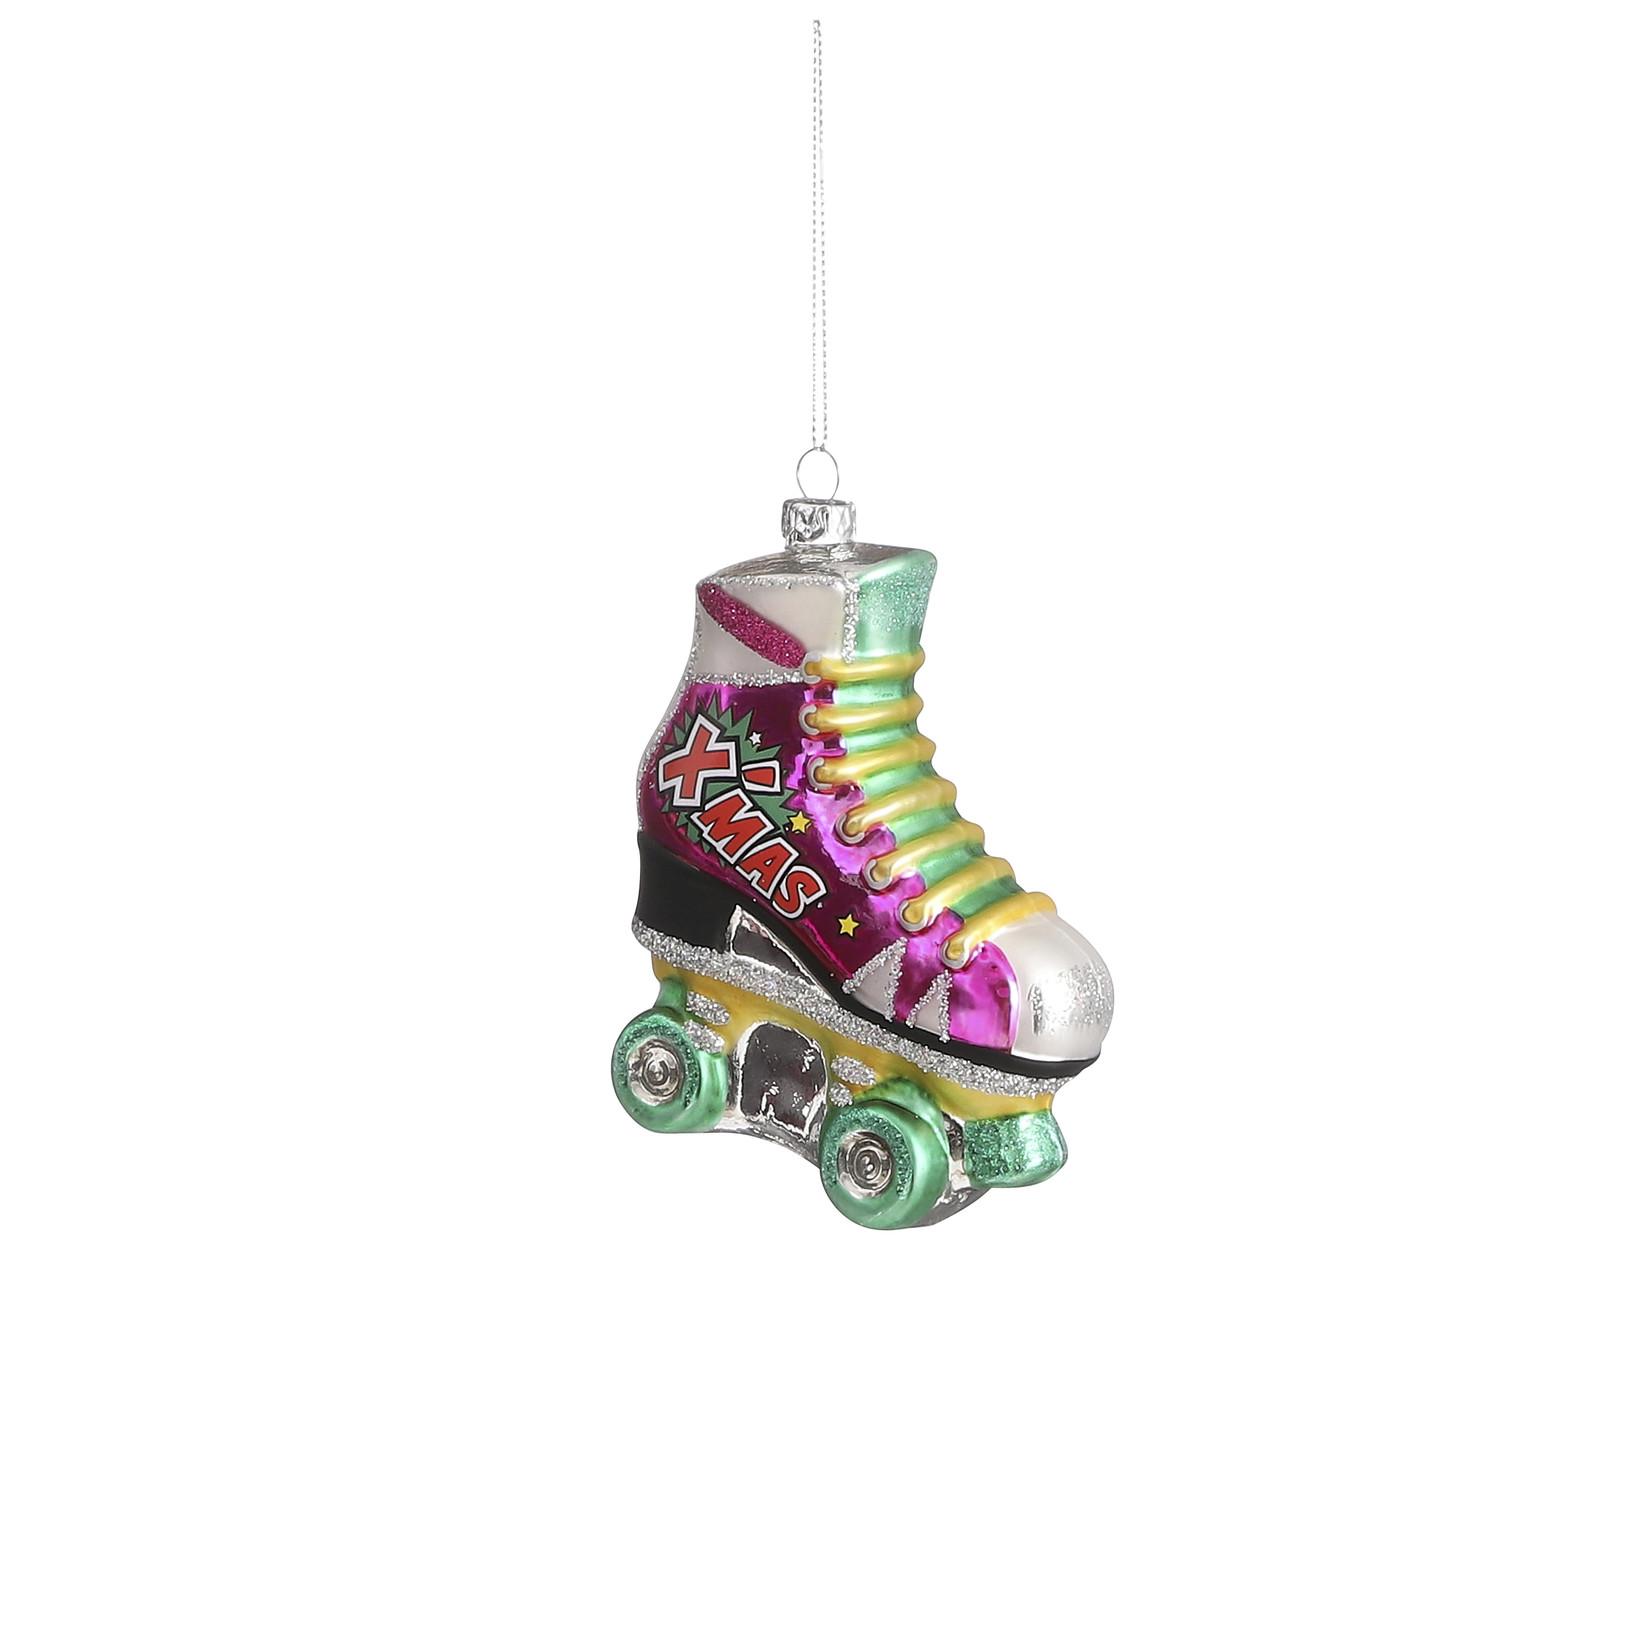 House of Seasons Ornament skate pink